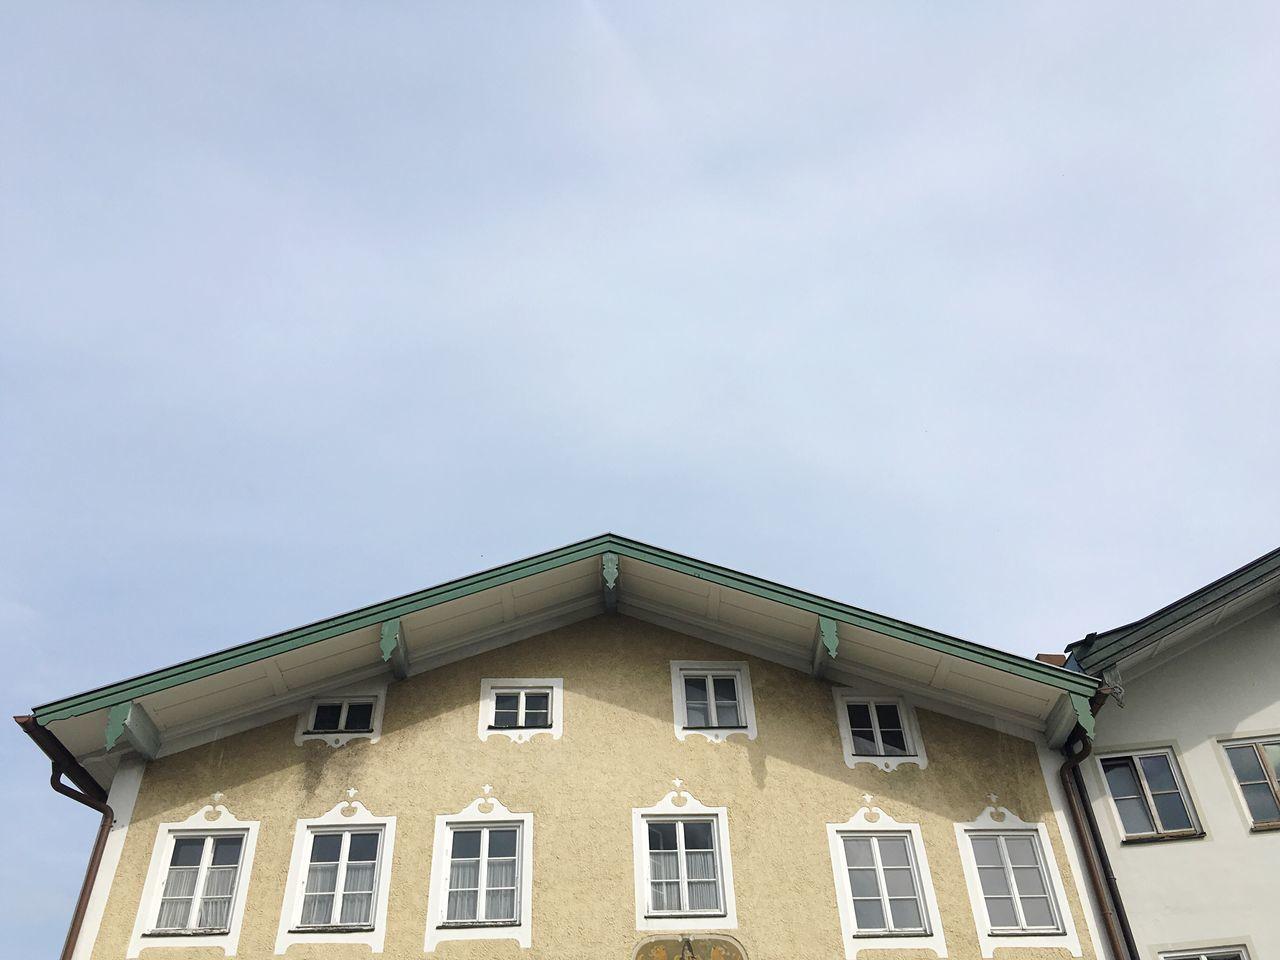 Bavarian Architecture Bad Tölz